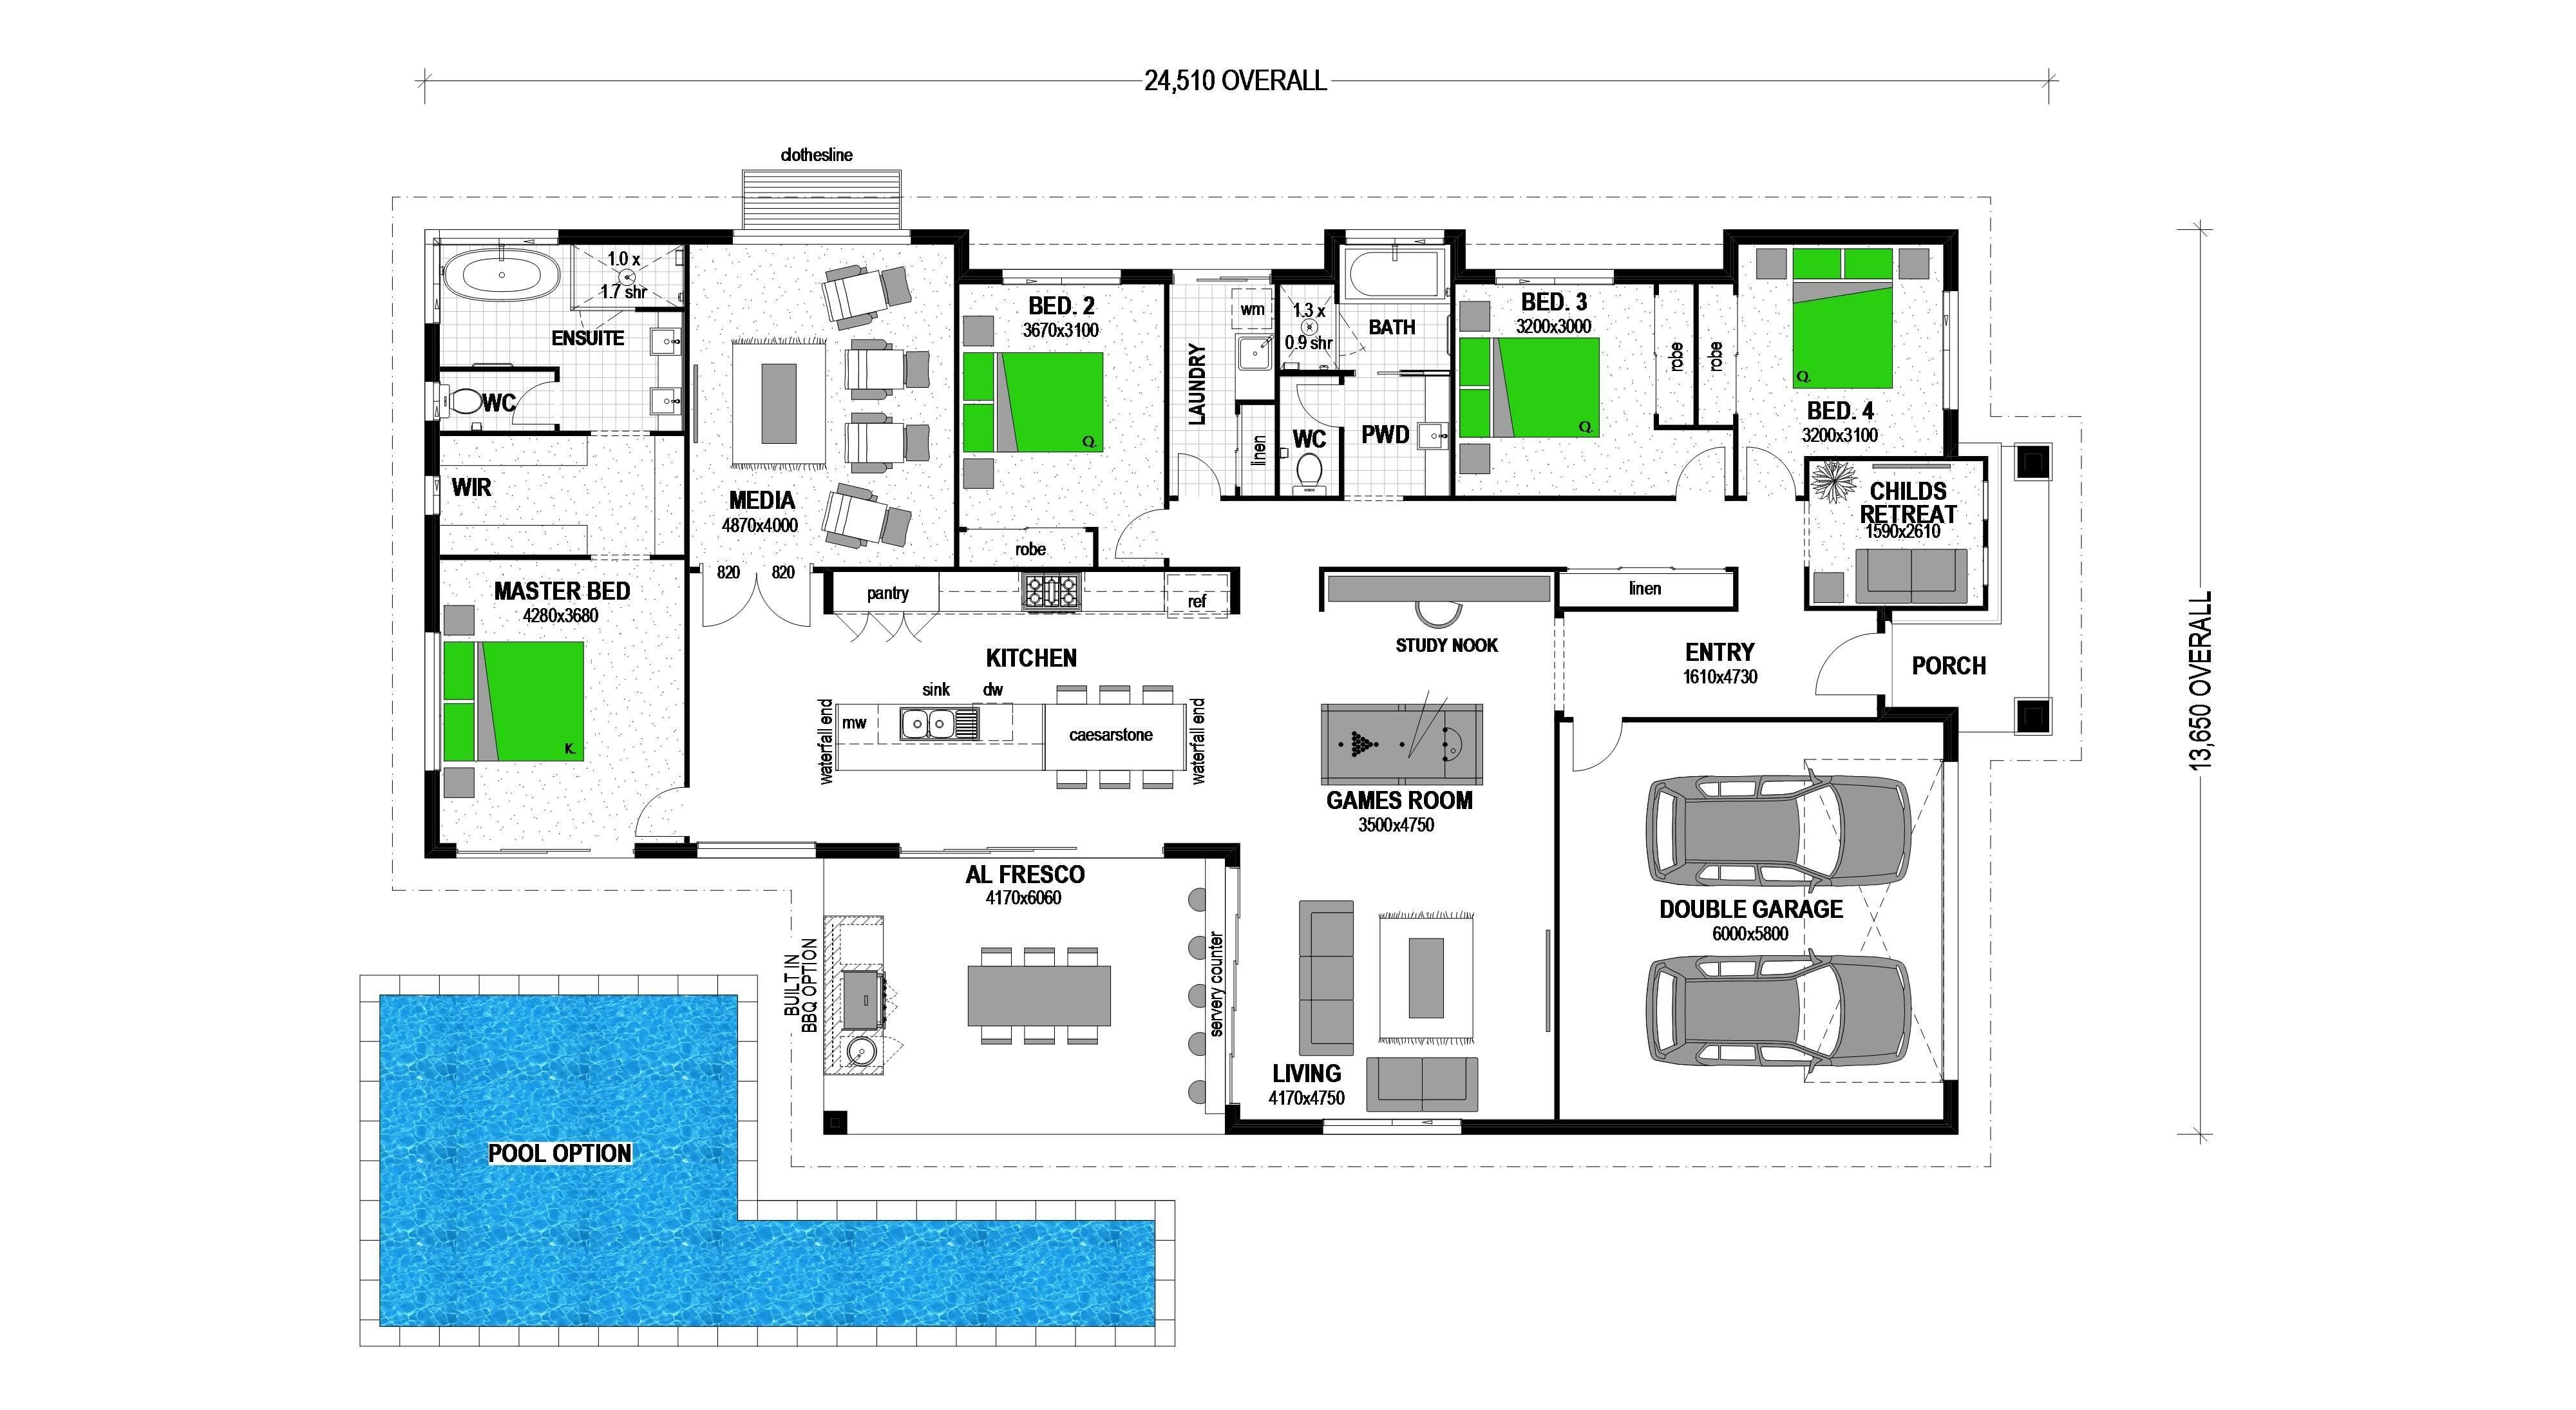 LOT 234 WILLOW ESTATE GISBORNE Floorplan